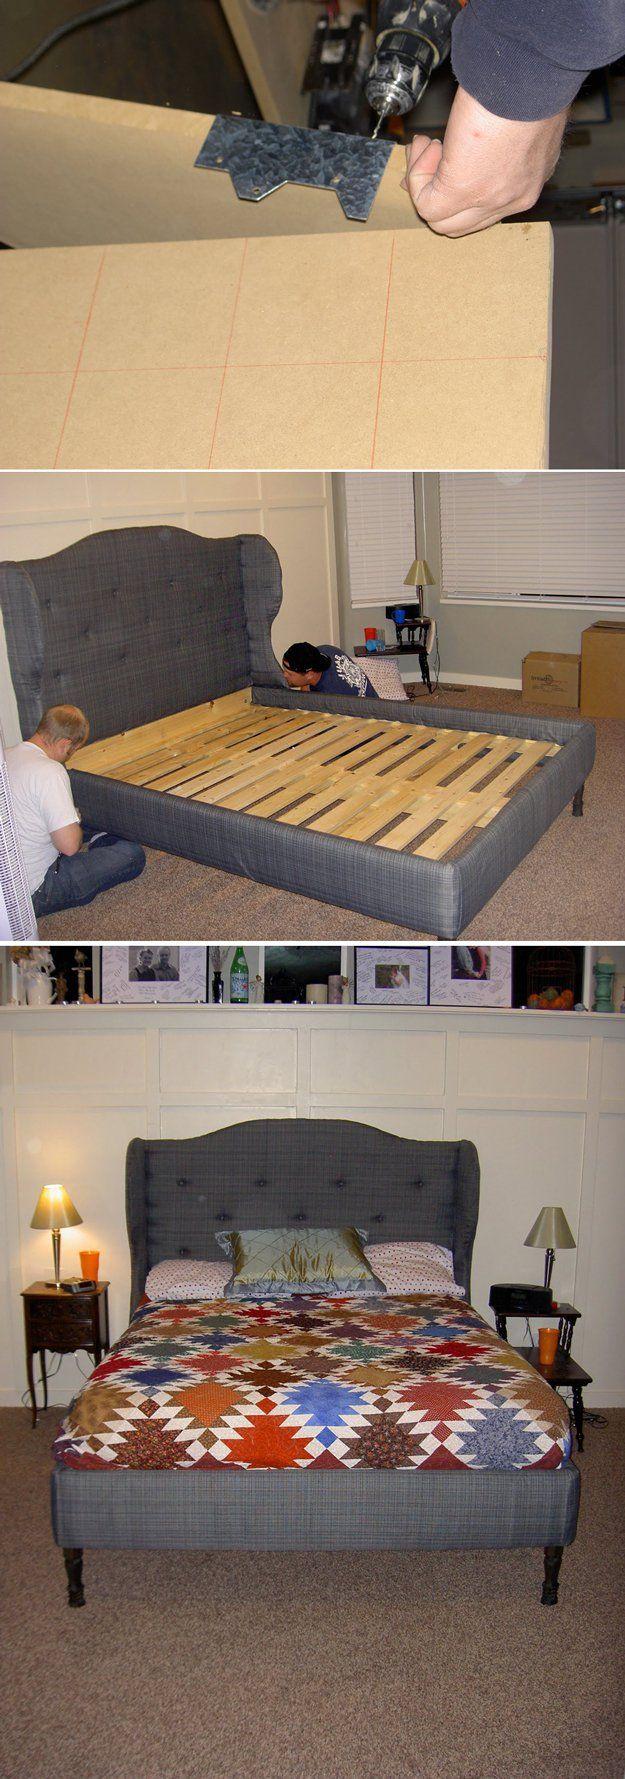 51 51 diy headboard ideas to make the bed of your dreams snappy pixels - Diy Headboard Ideas